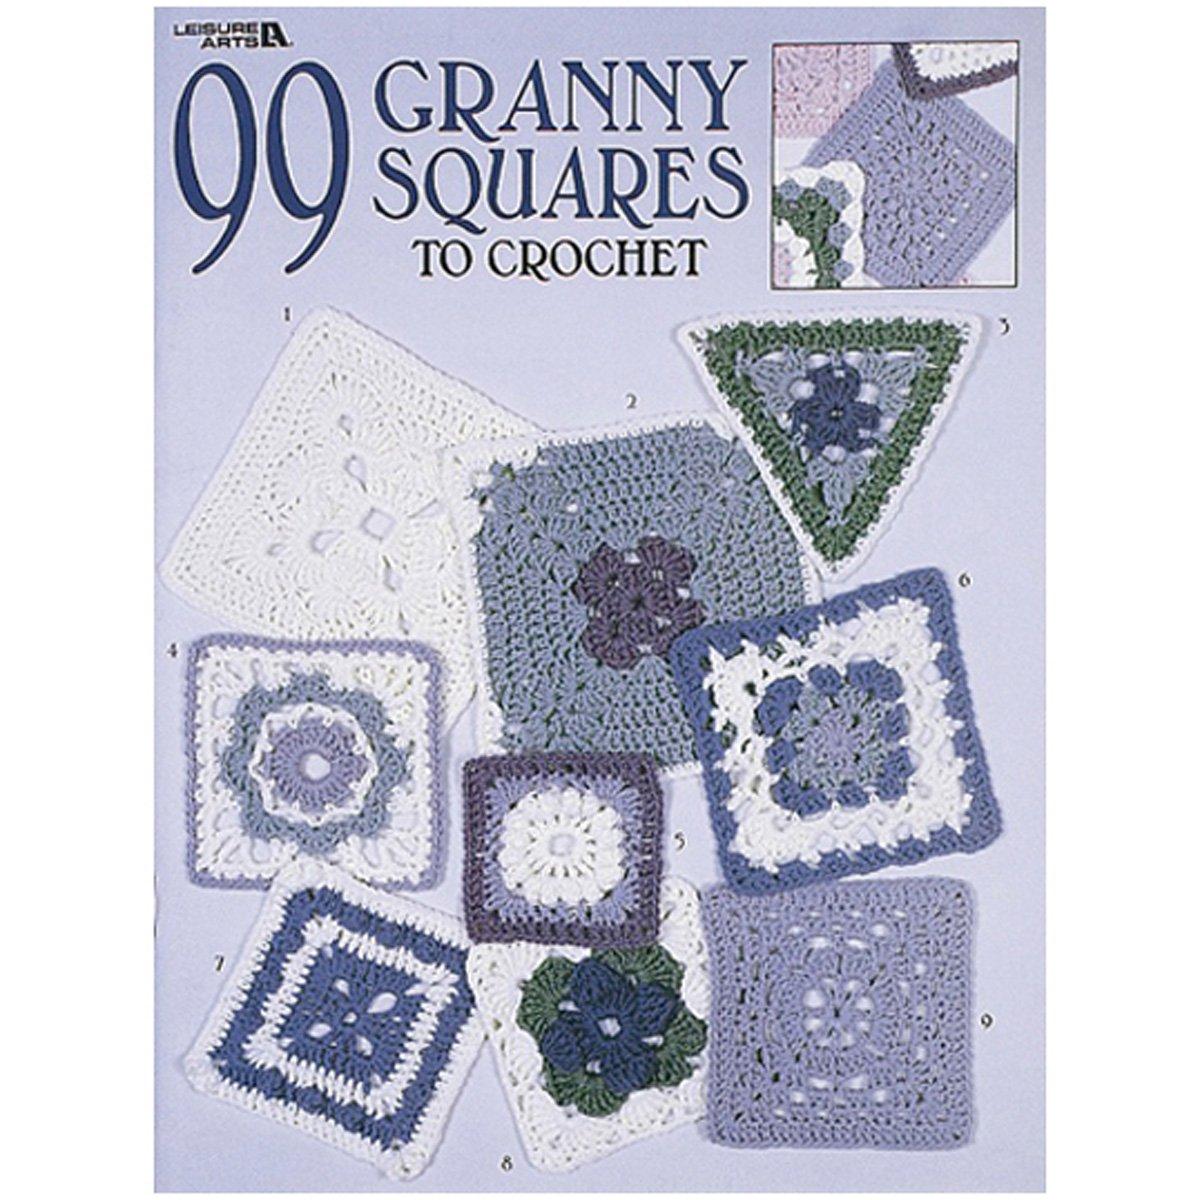 99 Granny Squares To Crochet Leisure Arts 3078